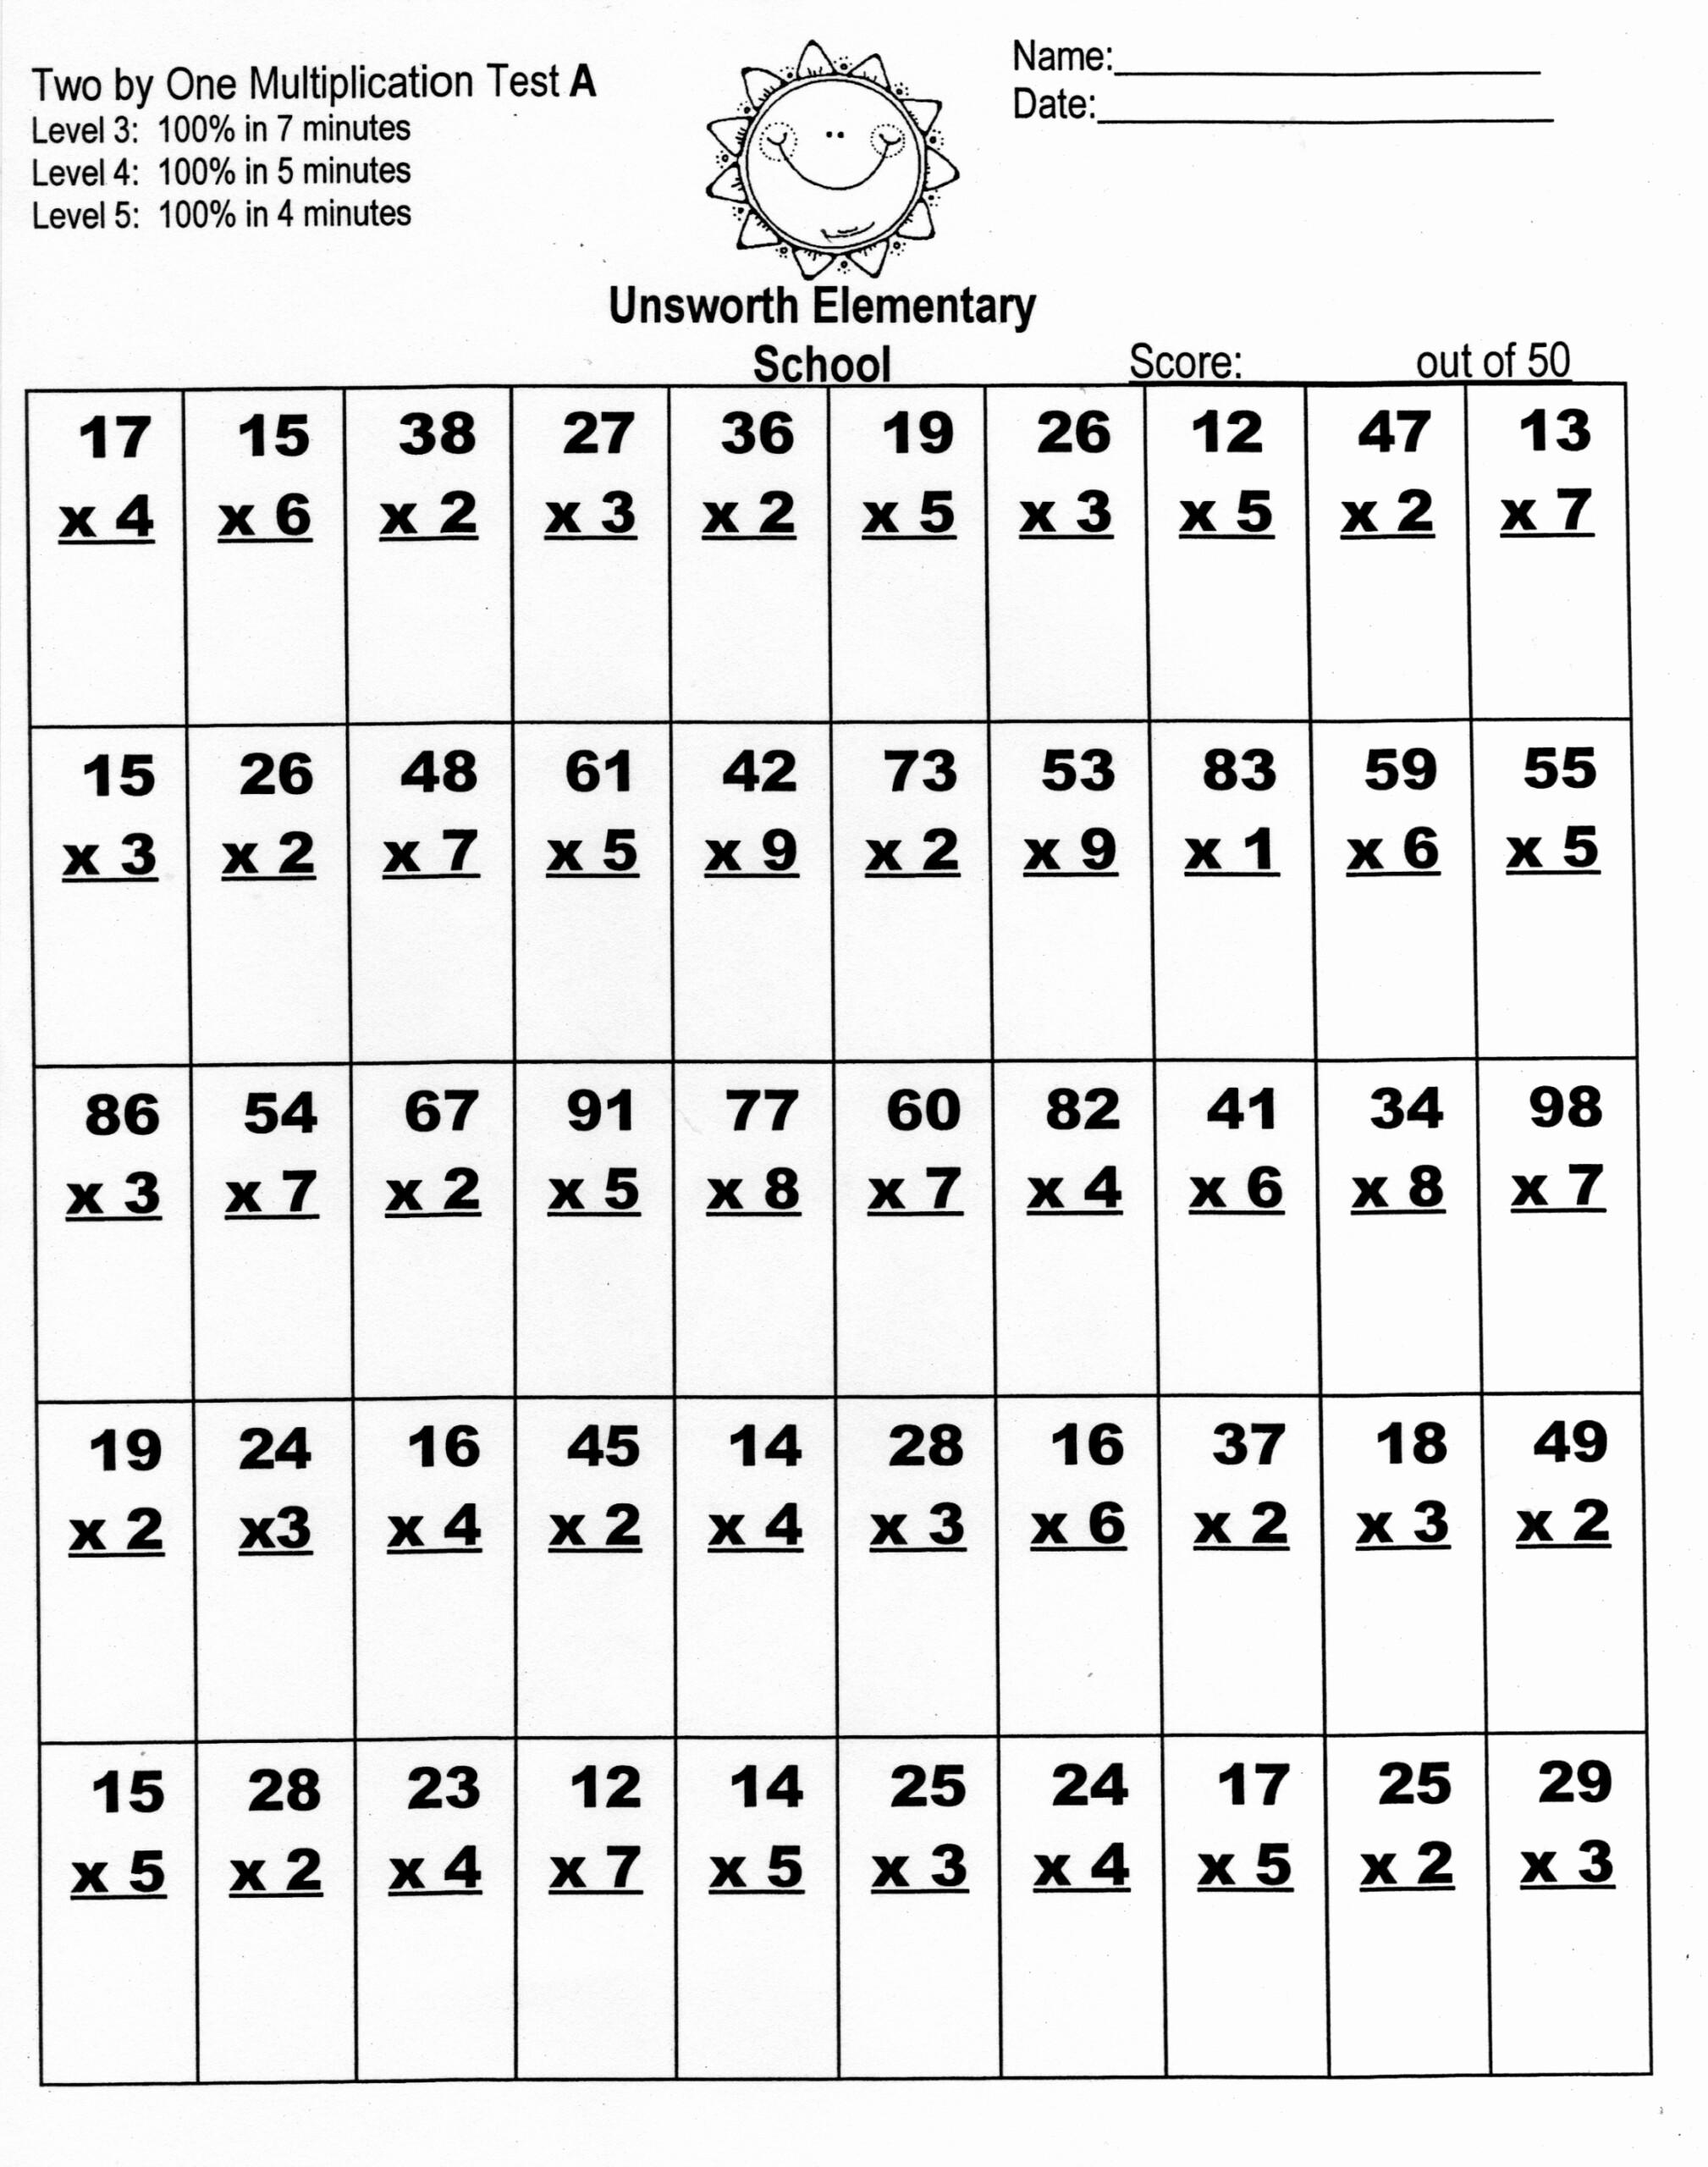 X7 Printable Math Worksheet | Printable Worksheets And for Multiplication Worksheets X2 X3